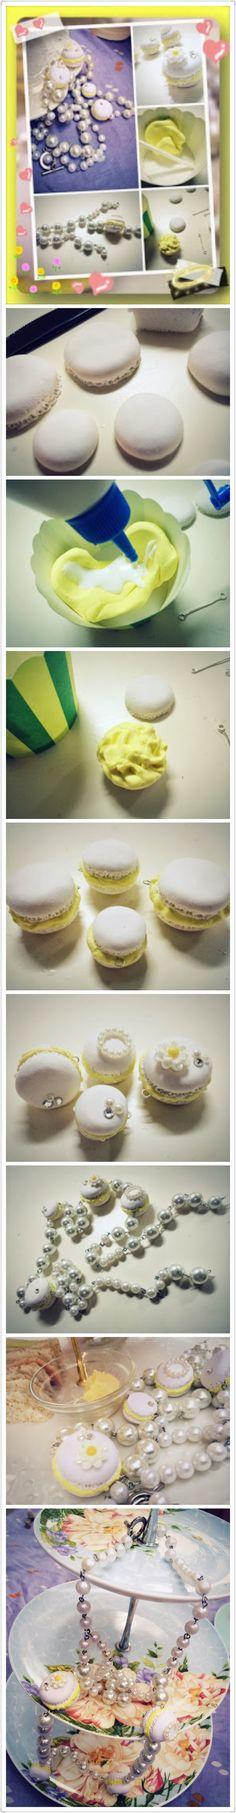 Lemon vanilla macaroon  http://siusally.blogspot.hk/2014/01/salleeejewelry-white-macaroon-with.html?m=1